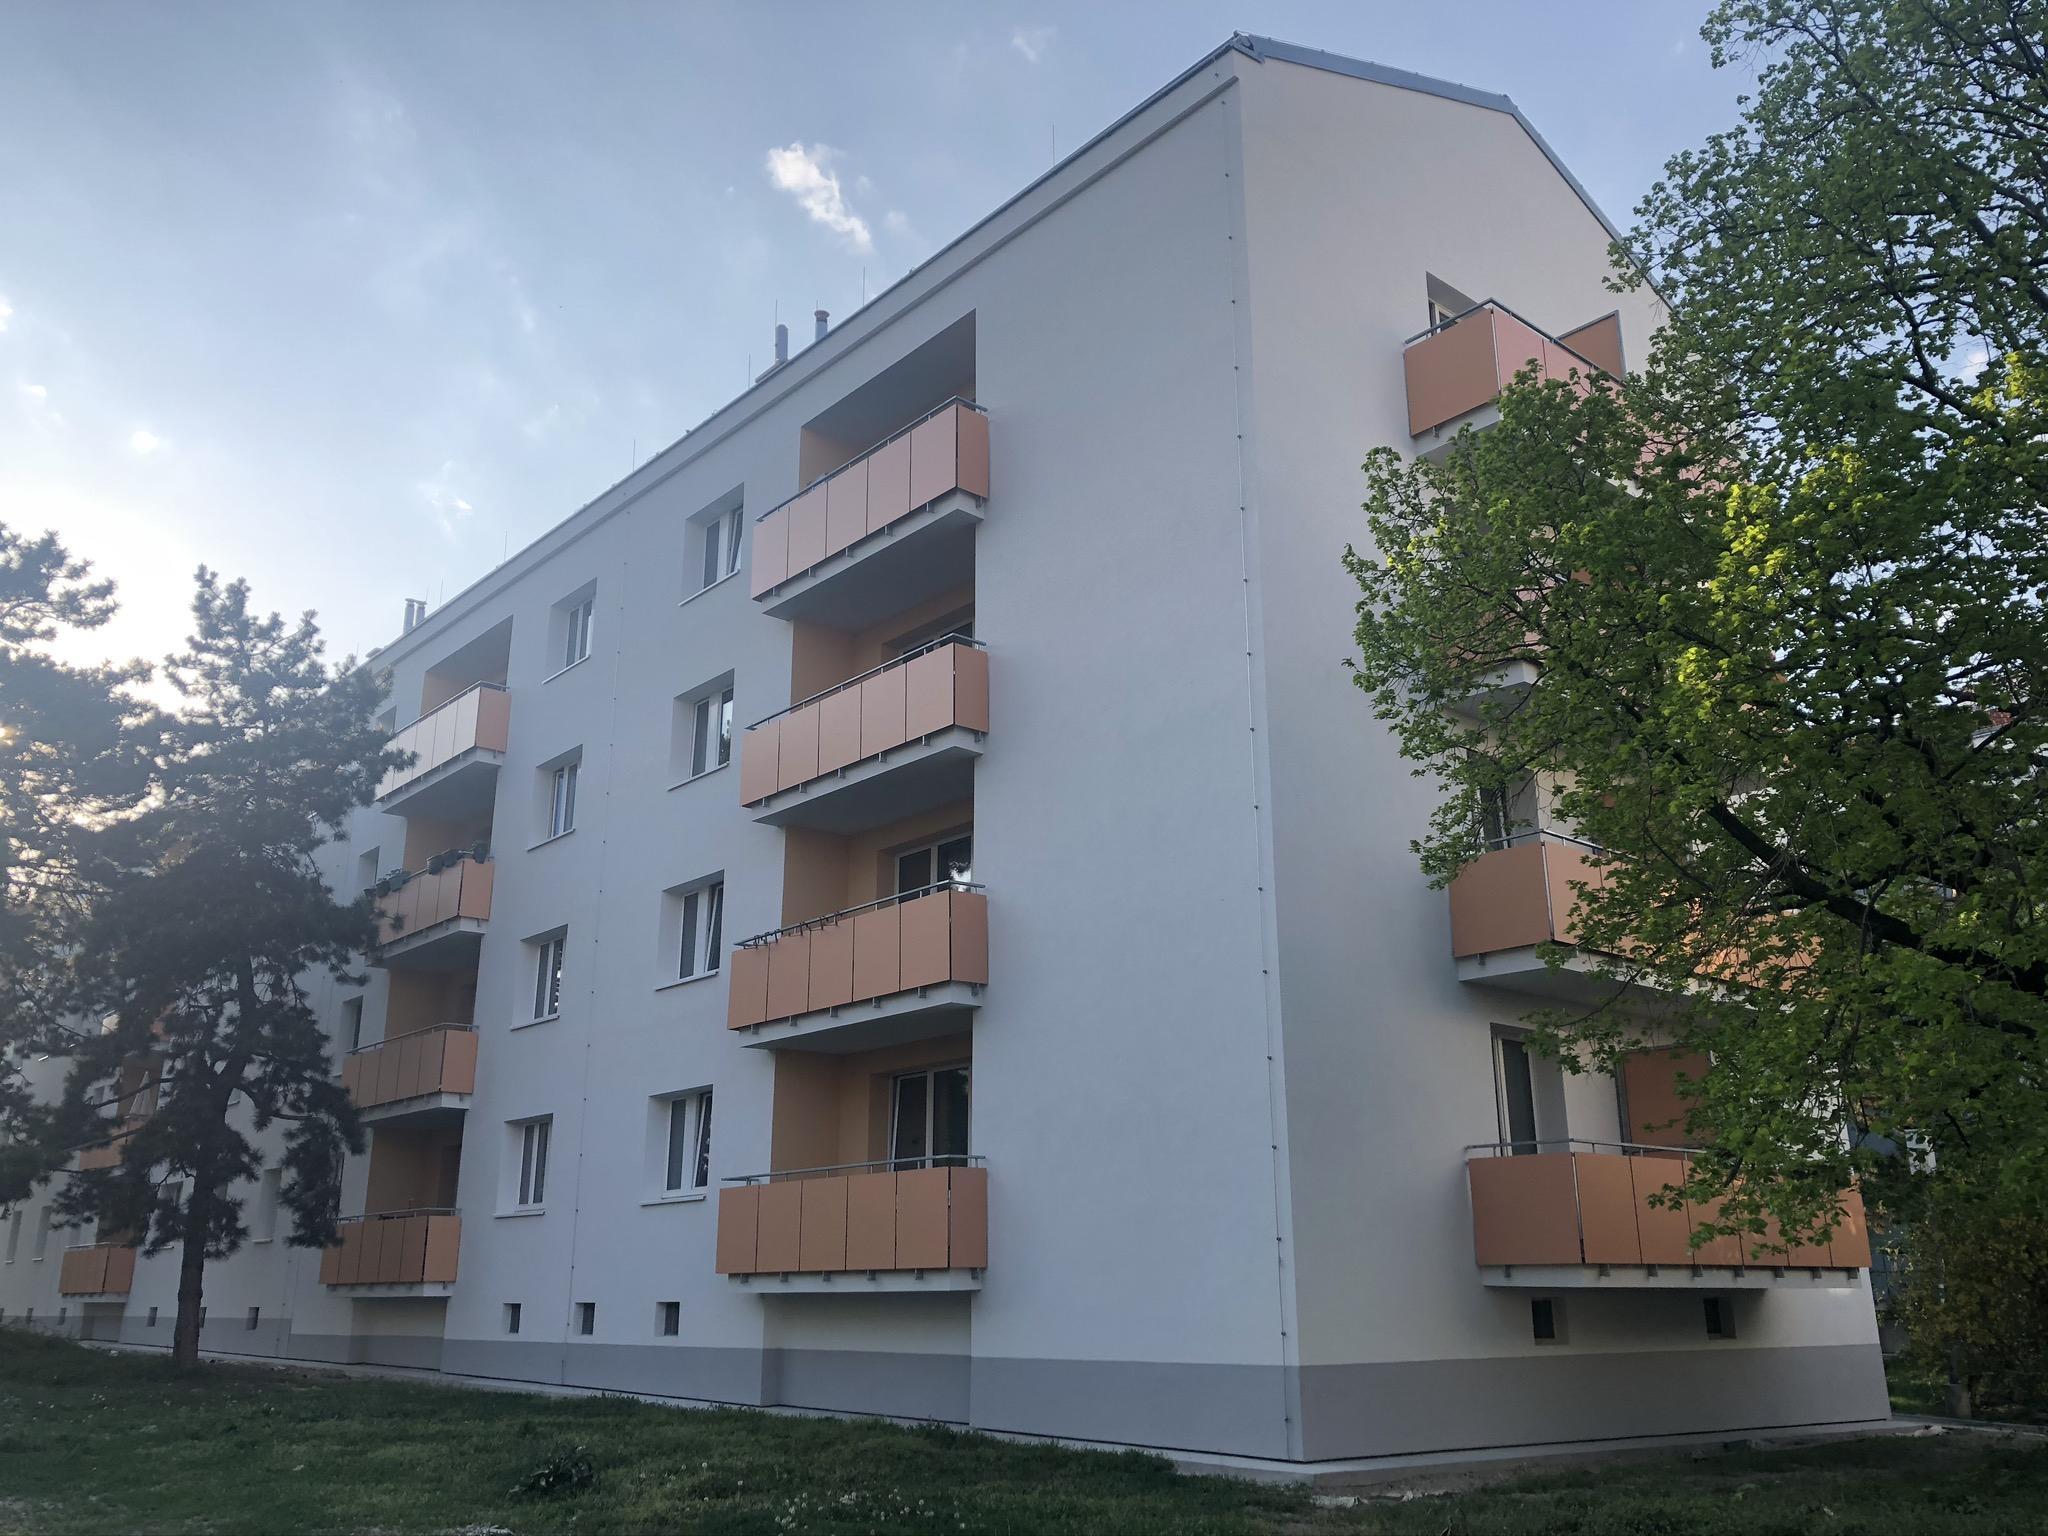 Markhof-Gasse-16